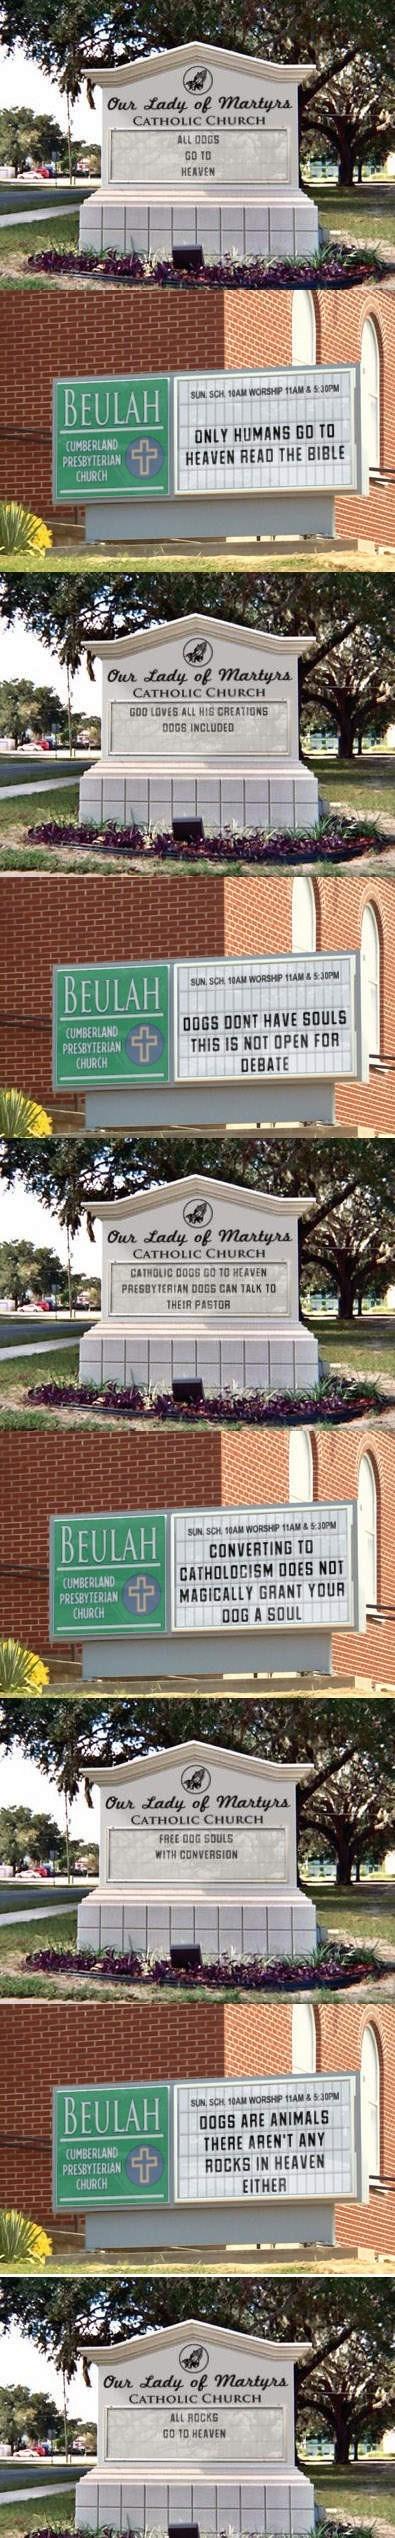 christianity heaven churches - 7930326528